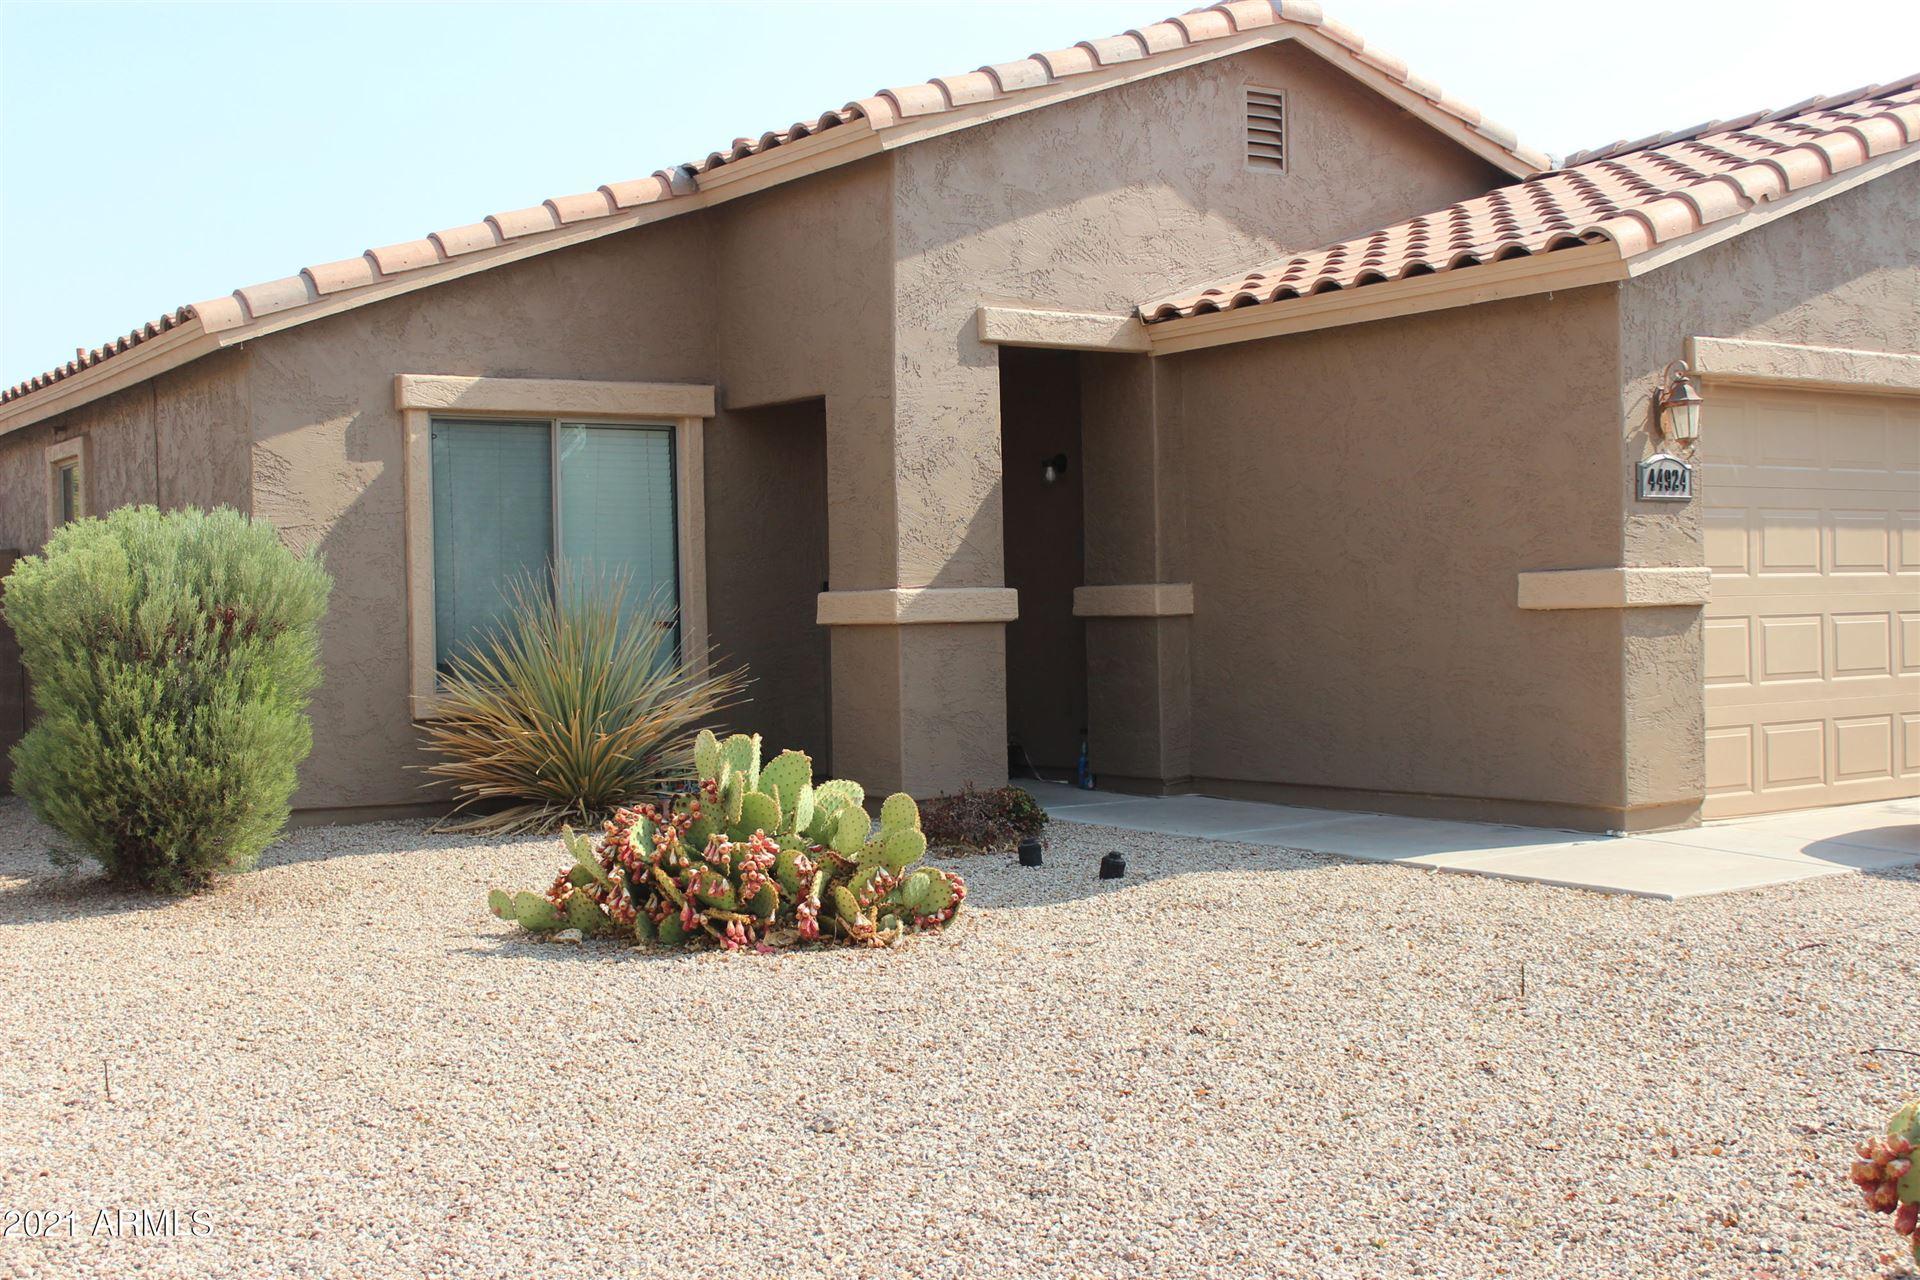 Photo for 44924 W BALBOA Drive, Maricopa, AZ 85139 (MLS # 6185046)